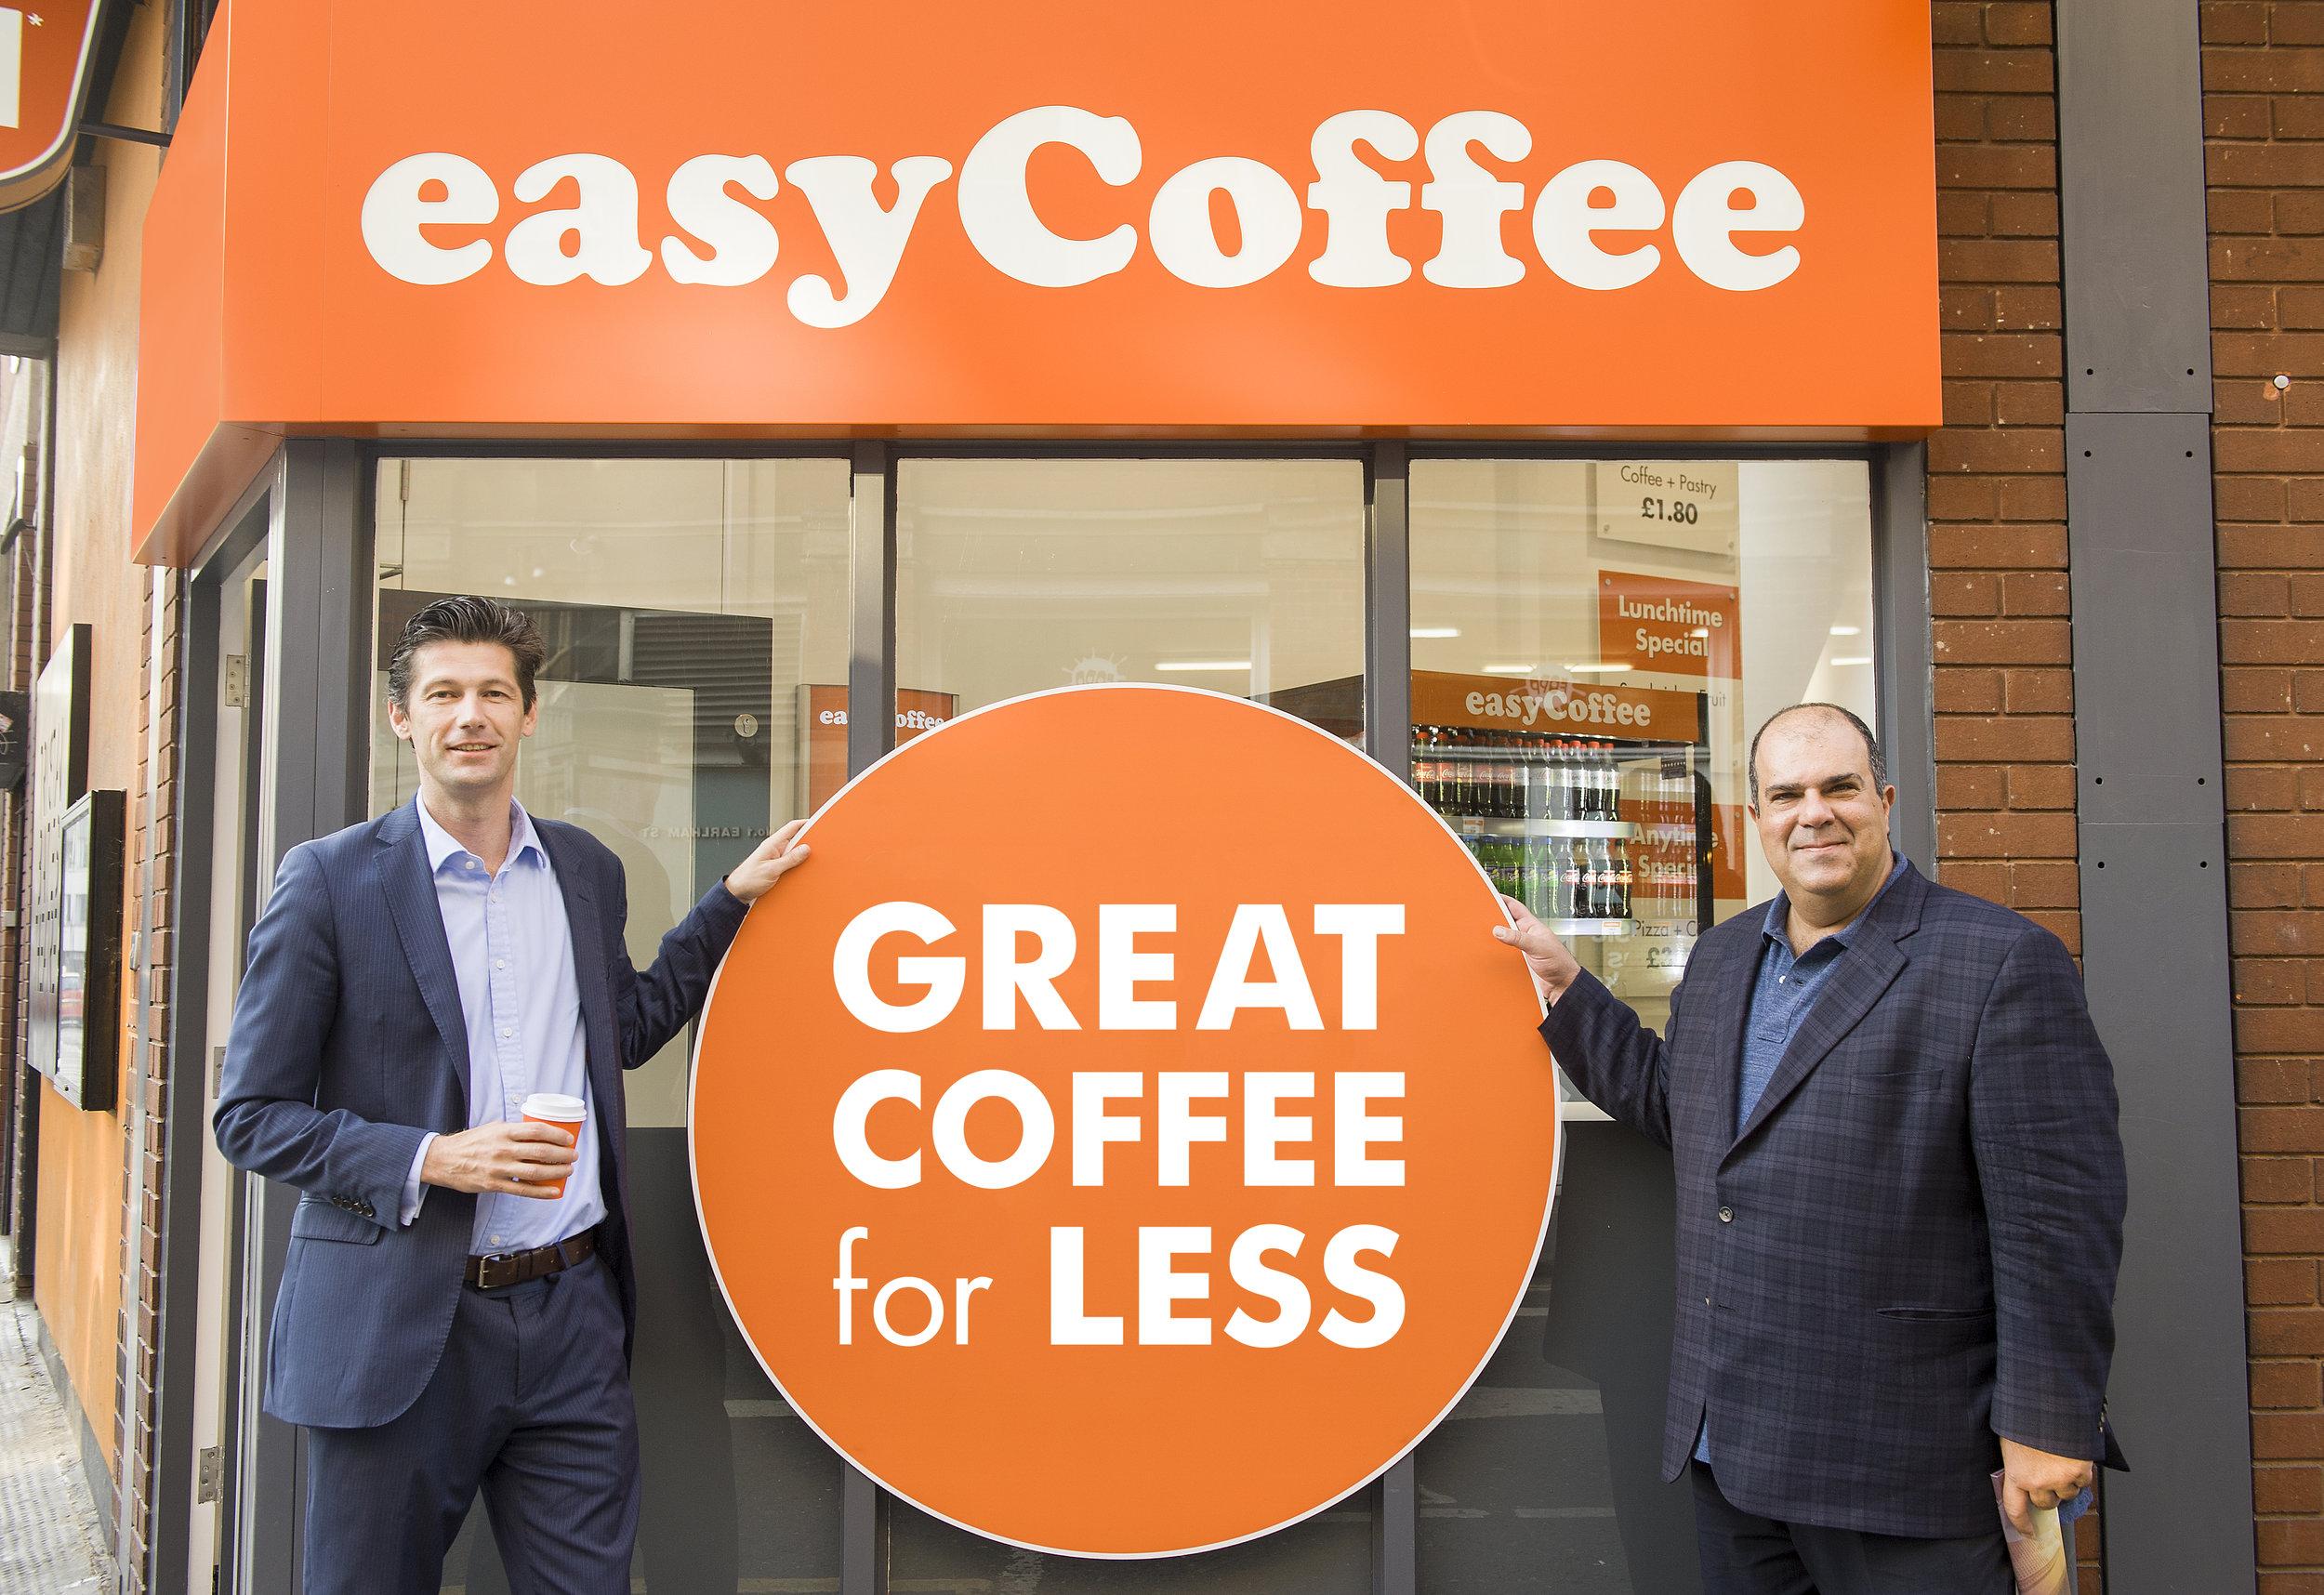 Co-Founders of easyCoffee  Nathan Lowry  | CEO of easyCoffee and  Sir Stelios  Haji-Ioannou | Chairman of easyGroup